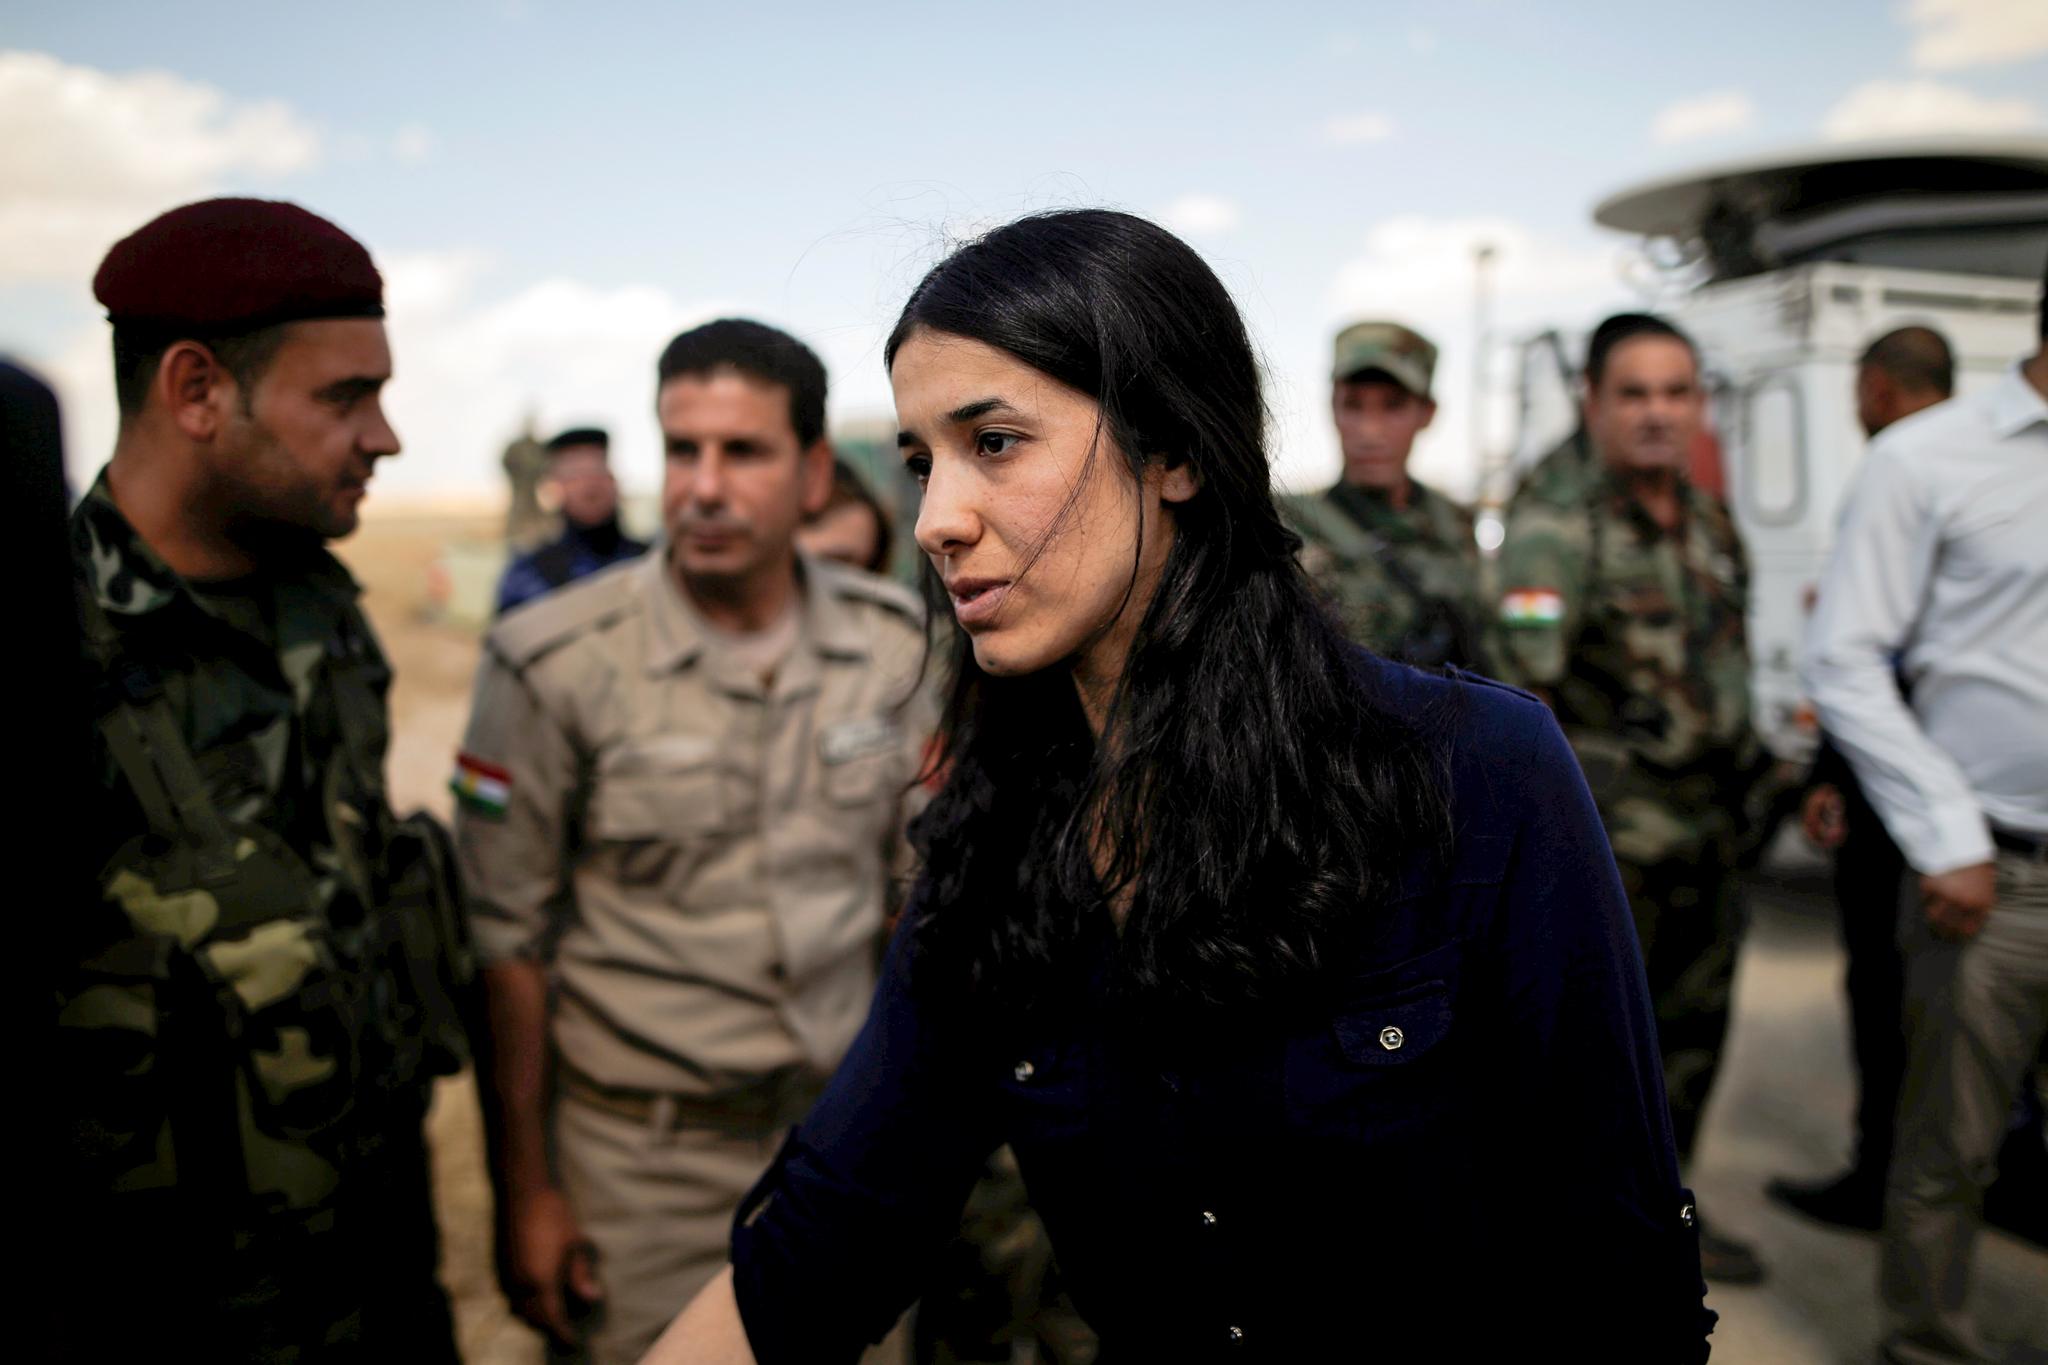 Woman standing among soldiers (© Alkis Konstantinidis/Reuters)